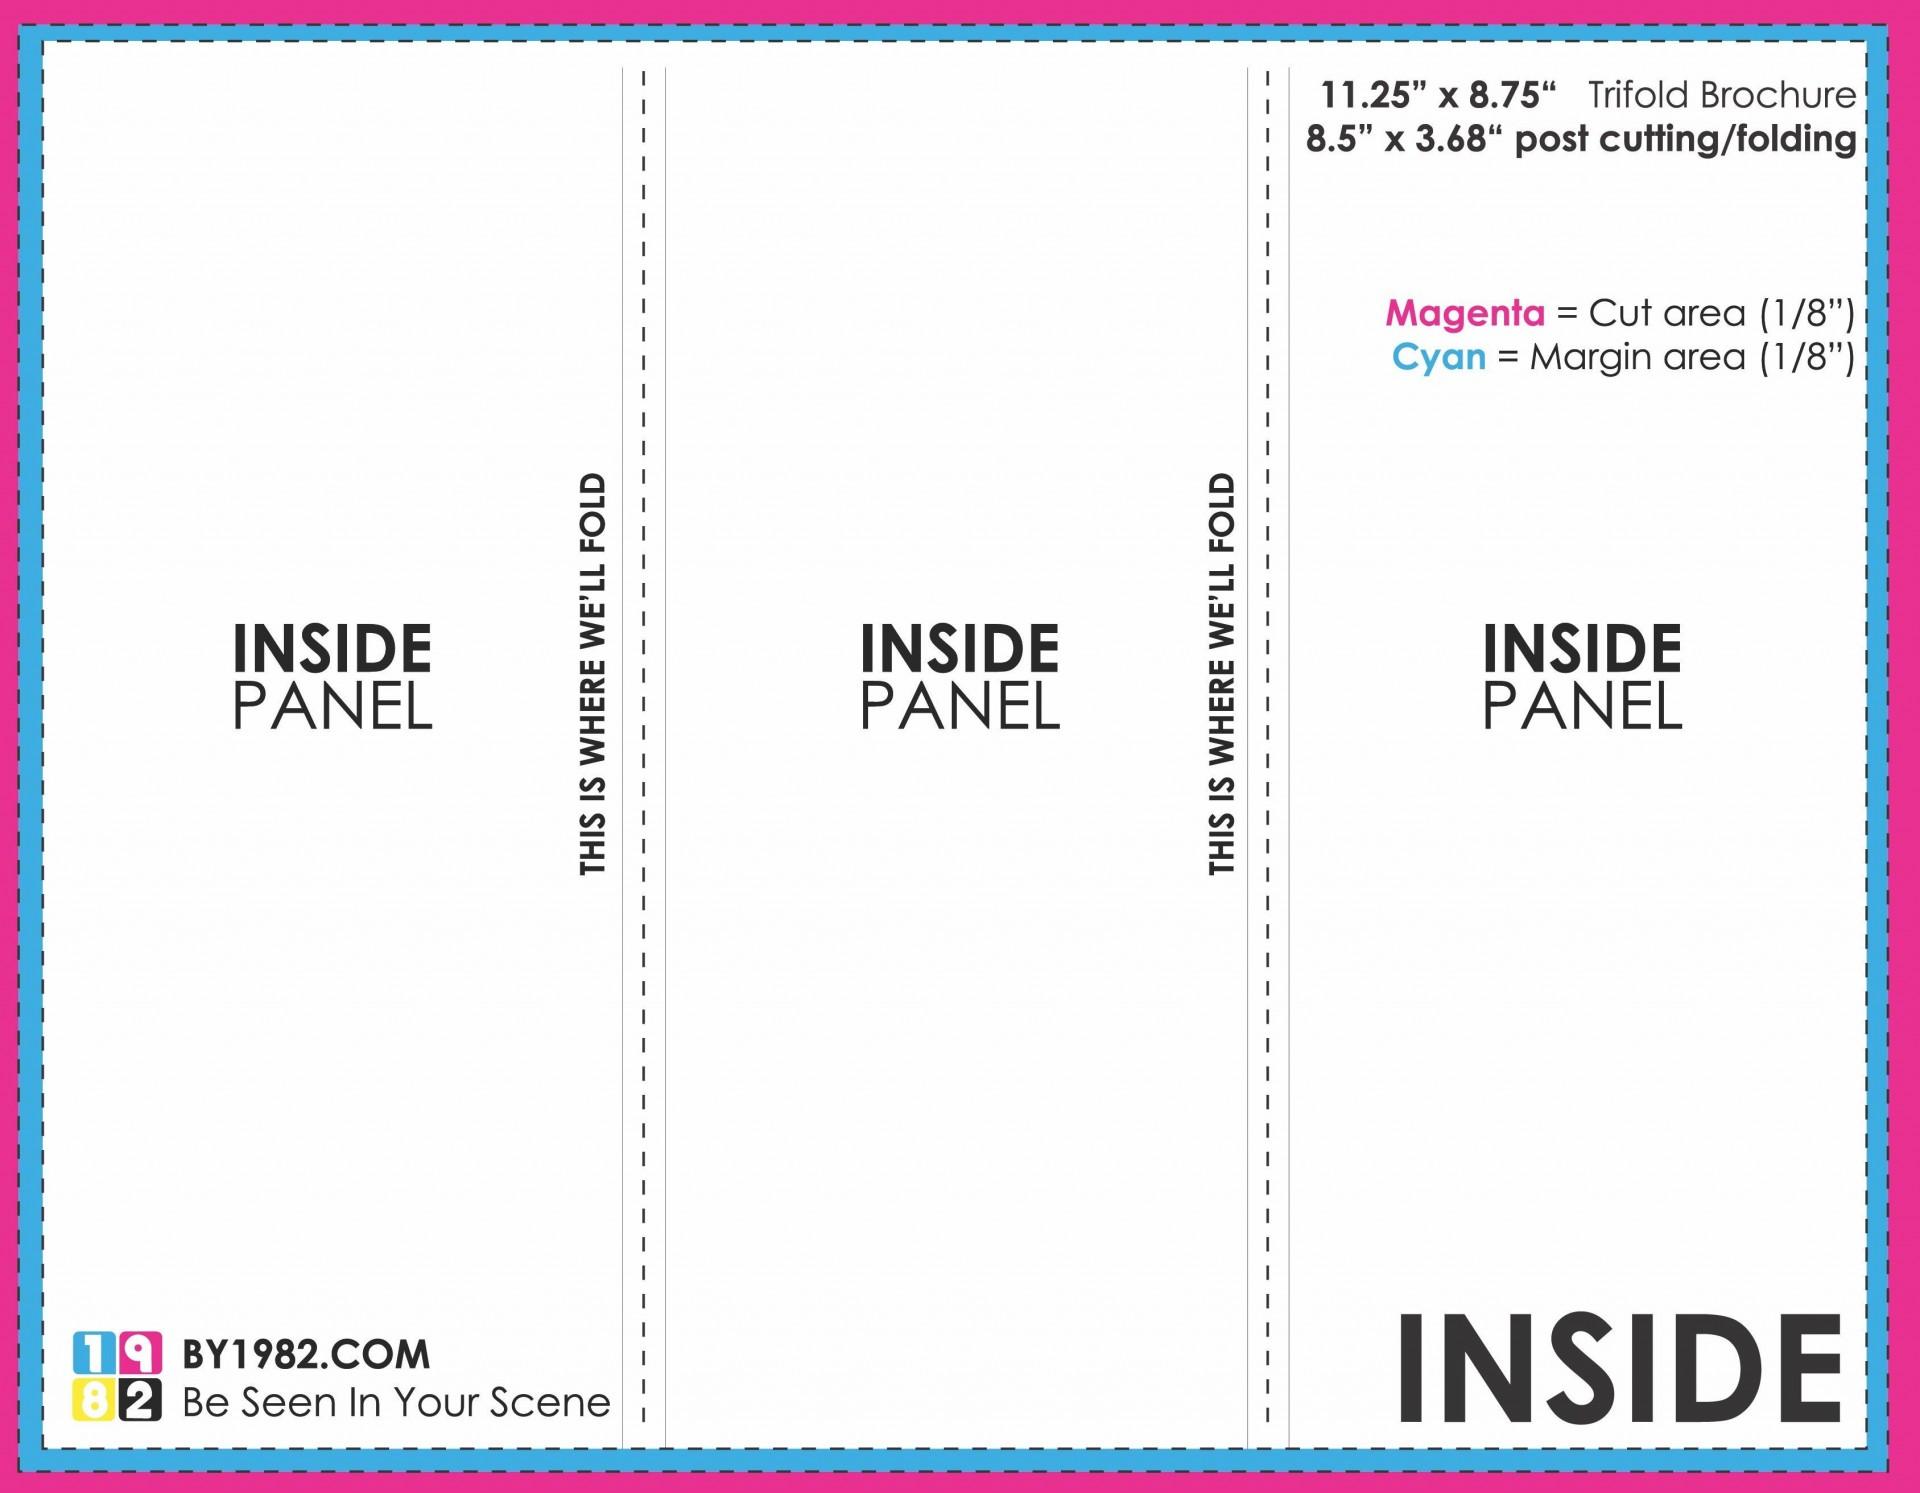 006 Fantastic Brochure Template Google Doc High Definition  Layout Blank Tri Fold1920